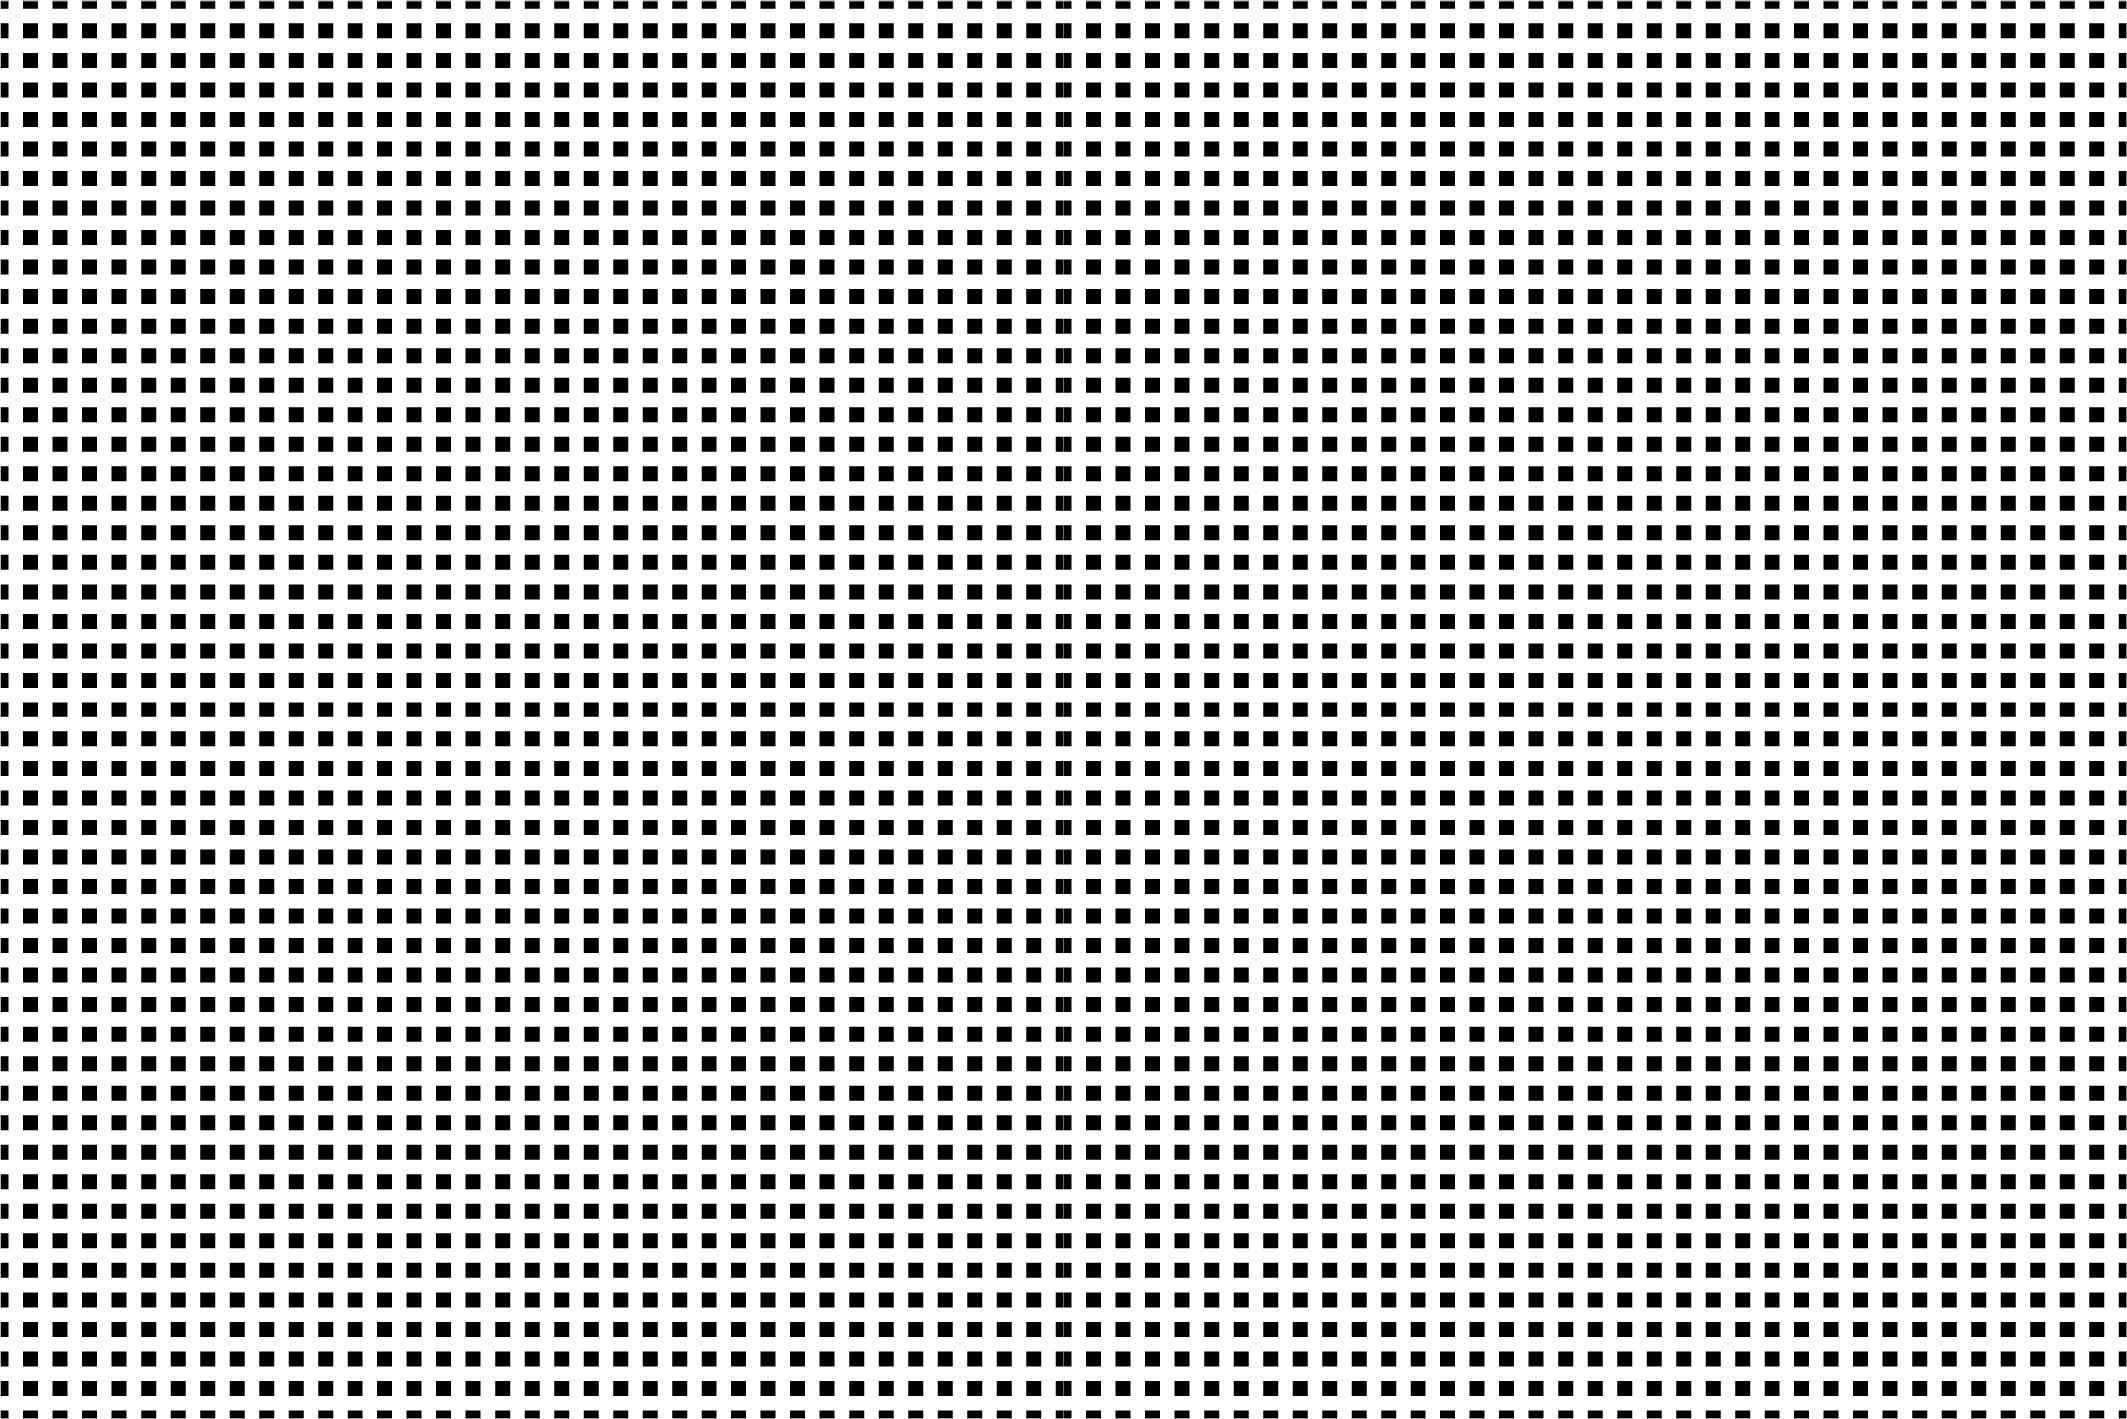 Seamless geometric patterns. B&W. example image 8